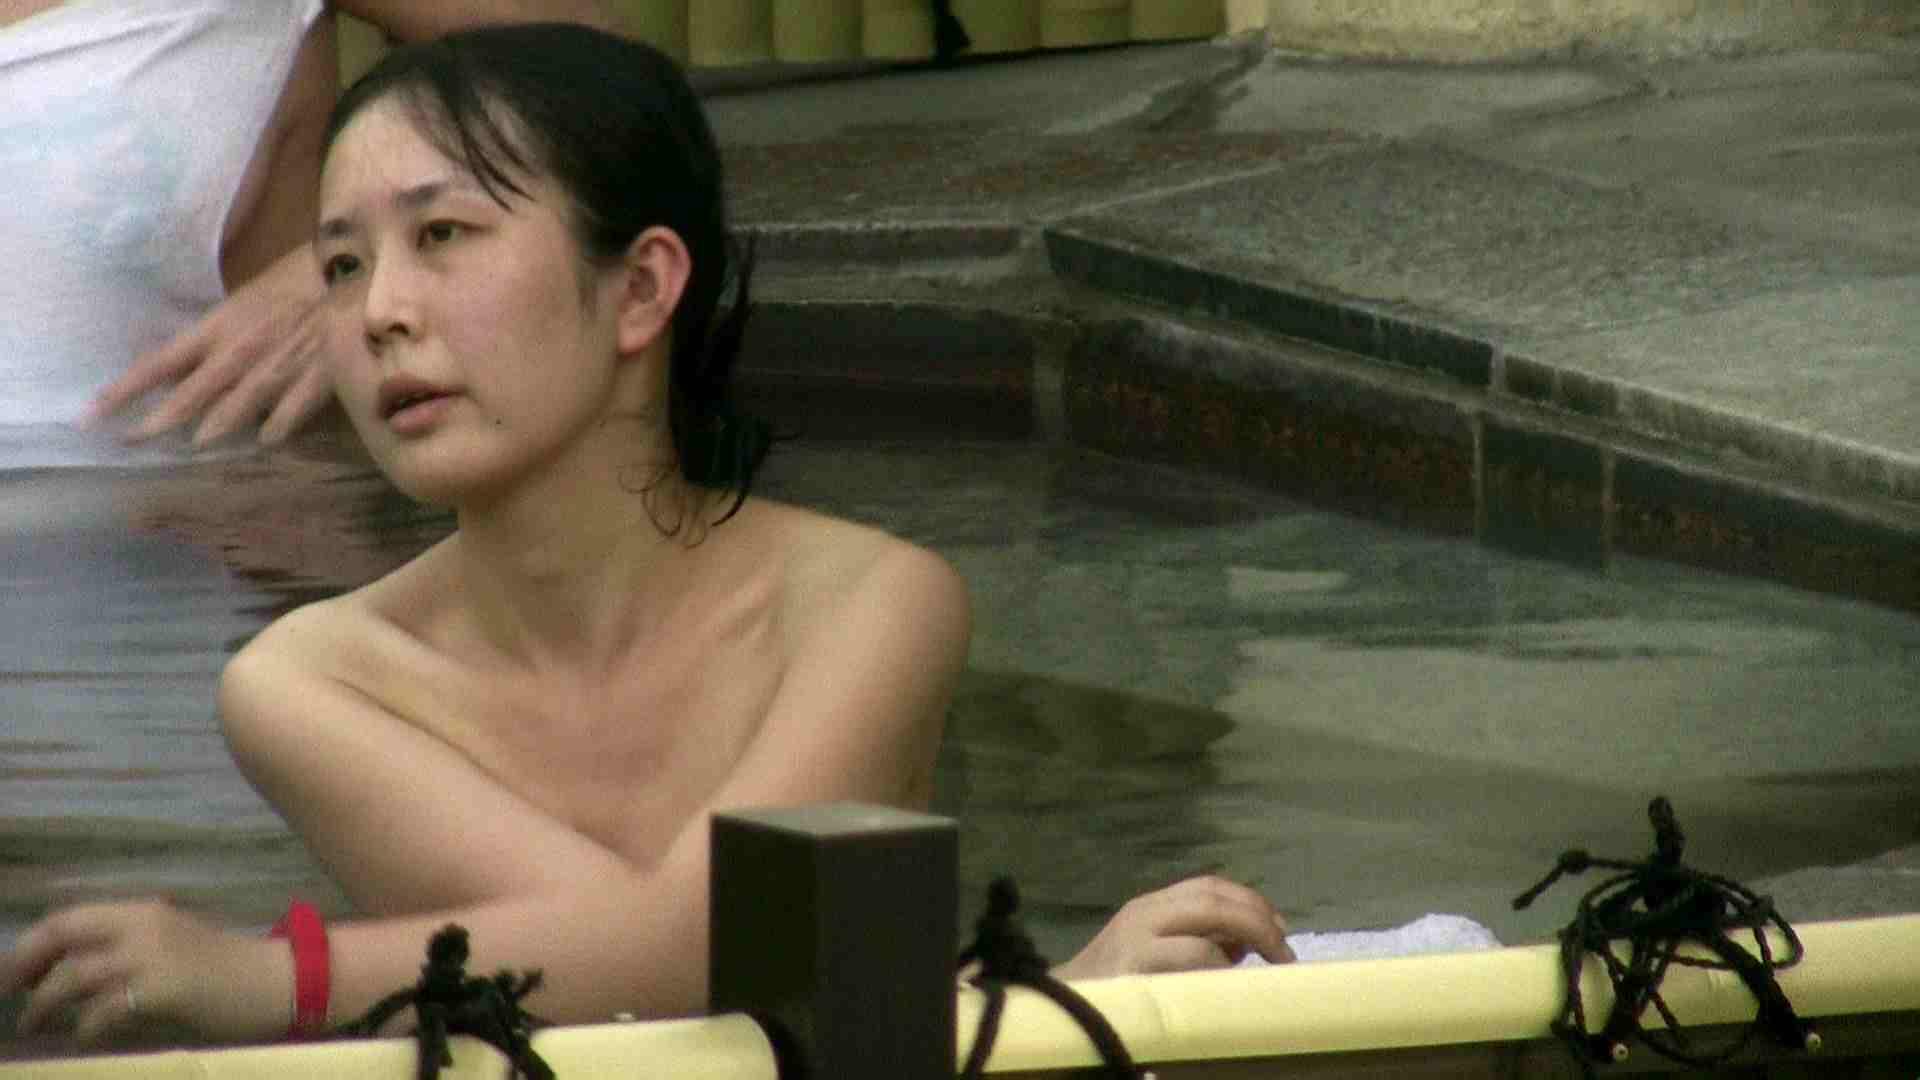 Aquaな露天風呂Vol.636 女体盗撮 盗み撮りSEX無修正画像 87連発 86